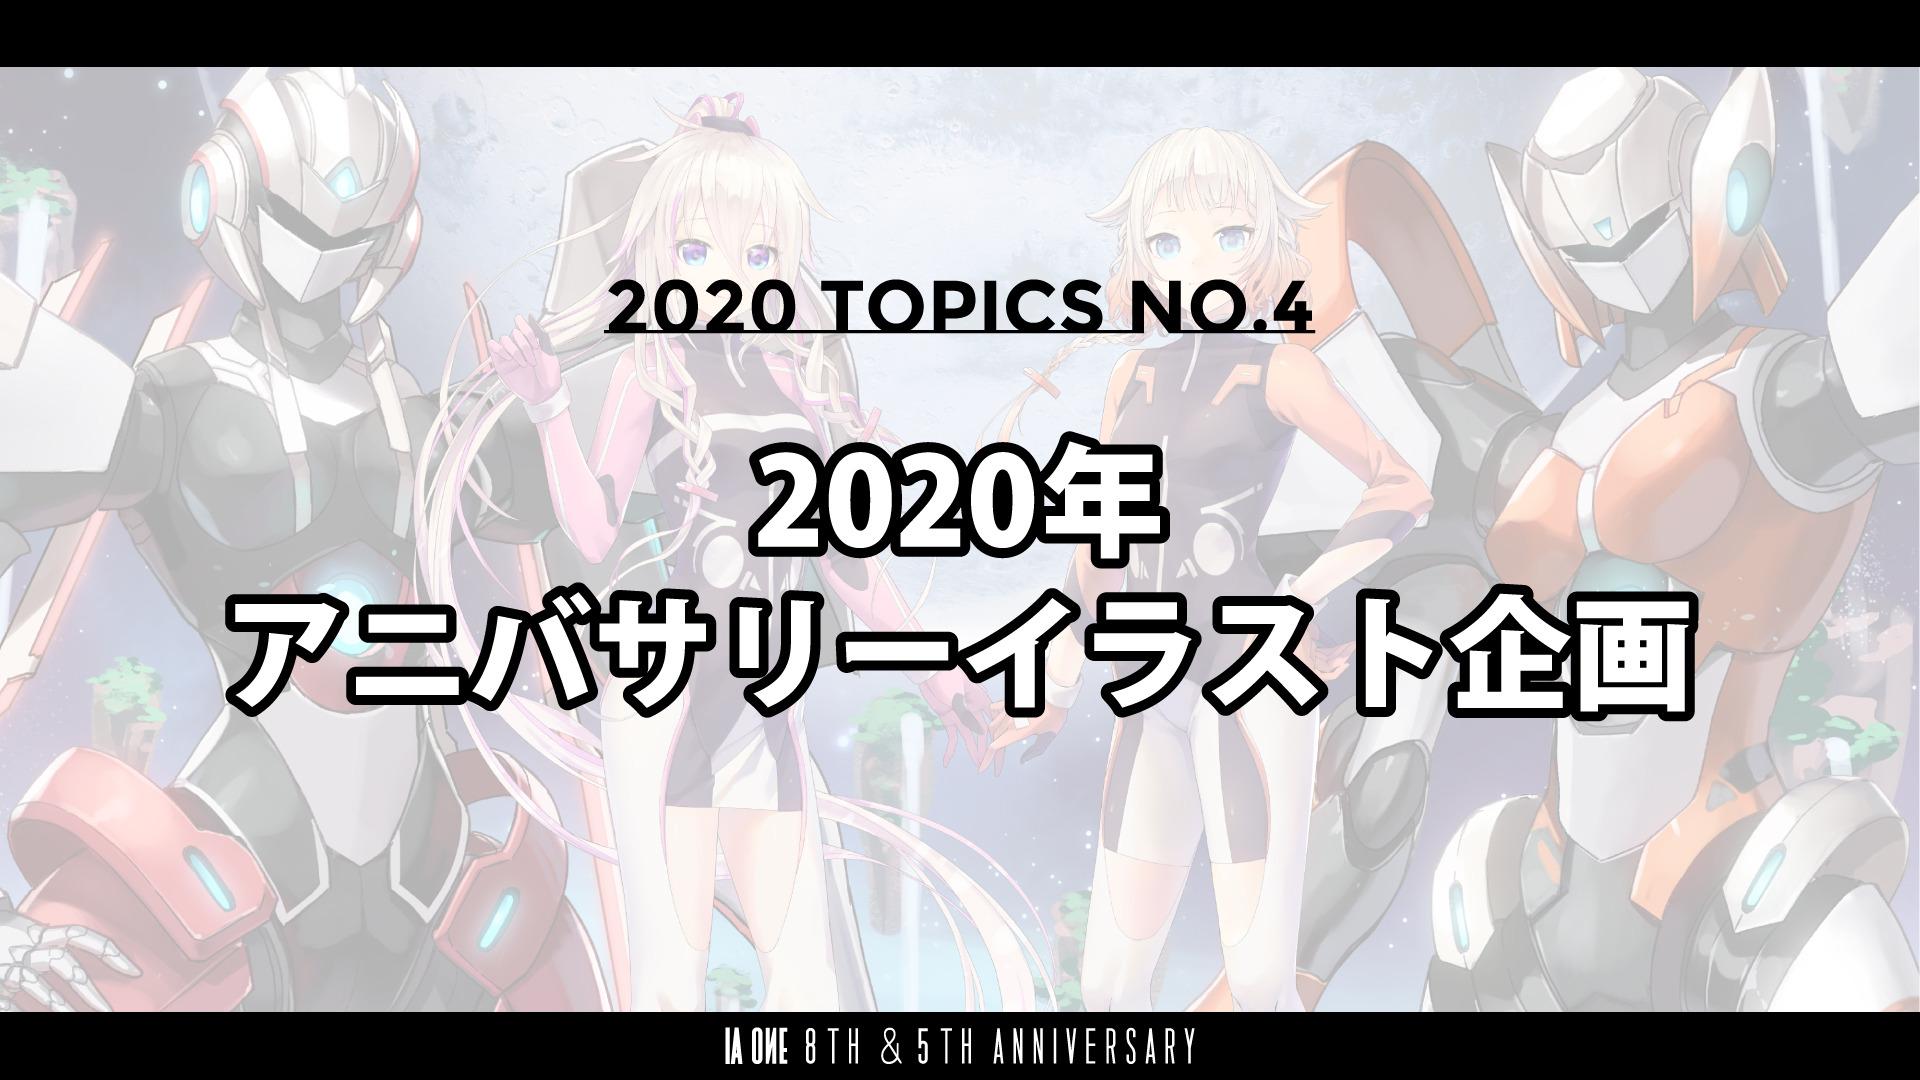 IA&ONEイラスト募集企画決定!